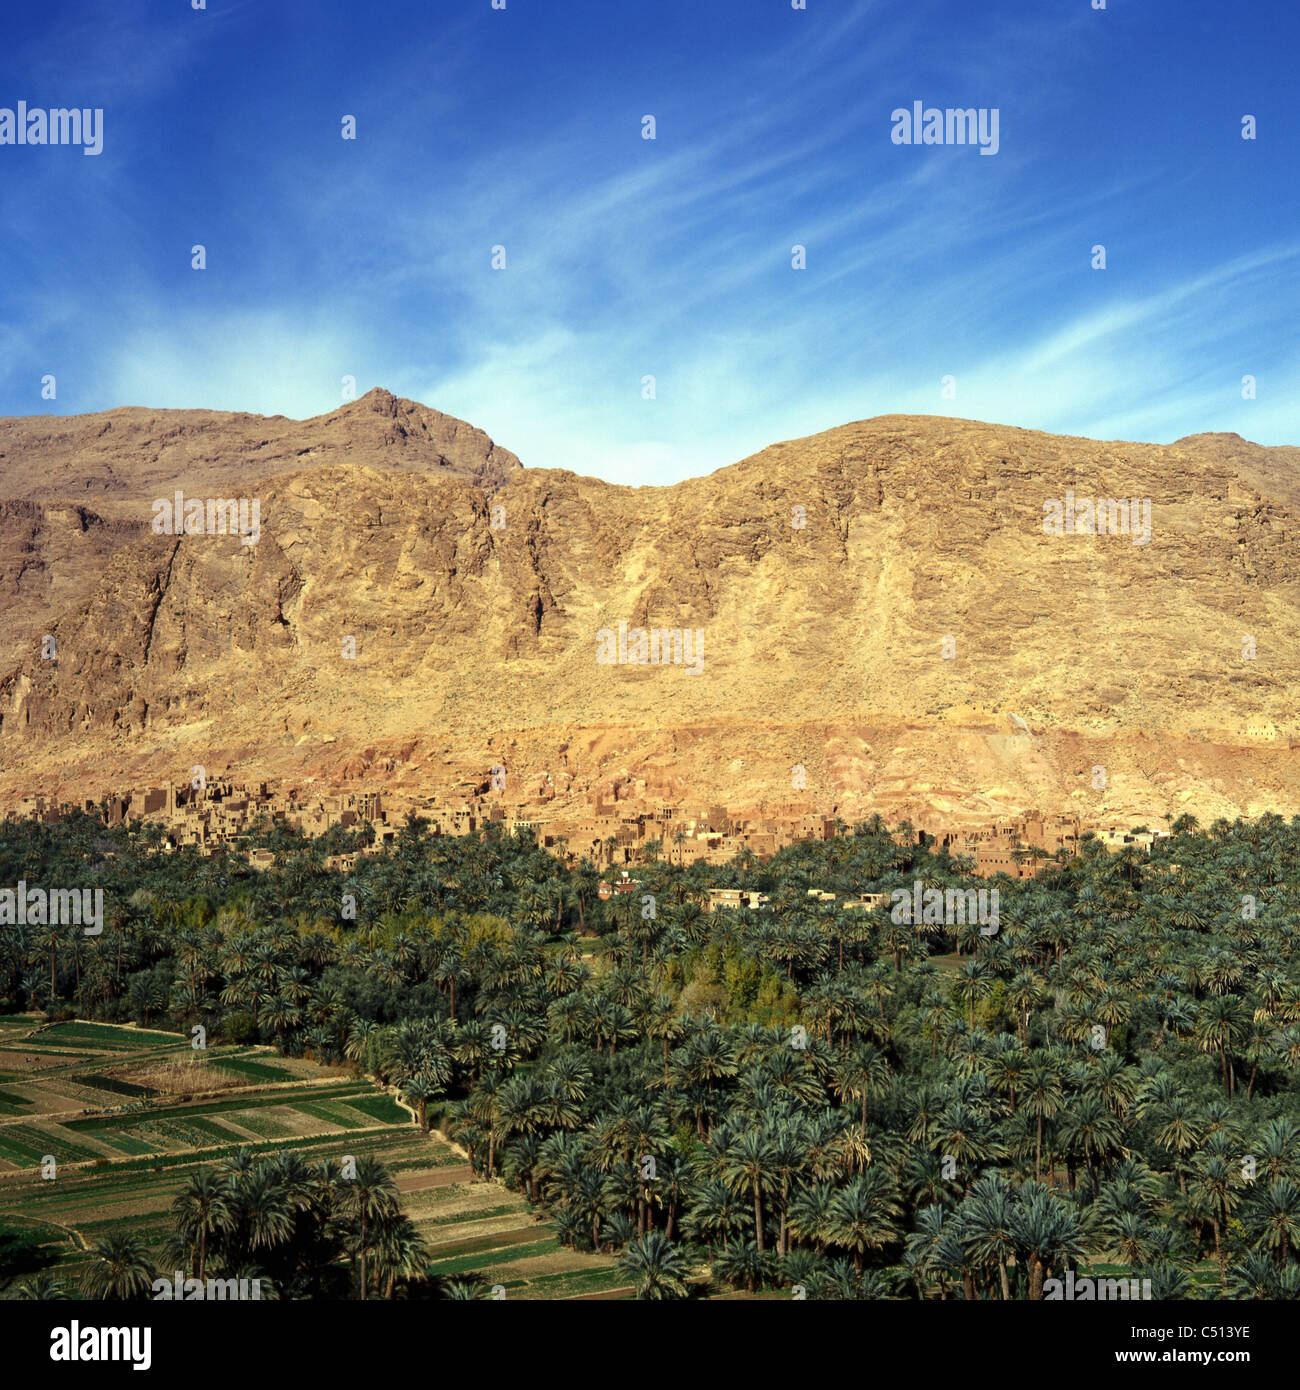 Morocco, Atlas Mountains - Stock Image